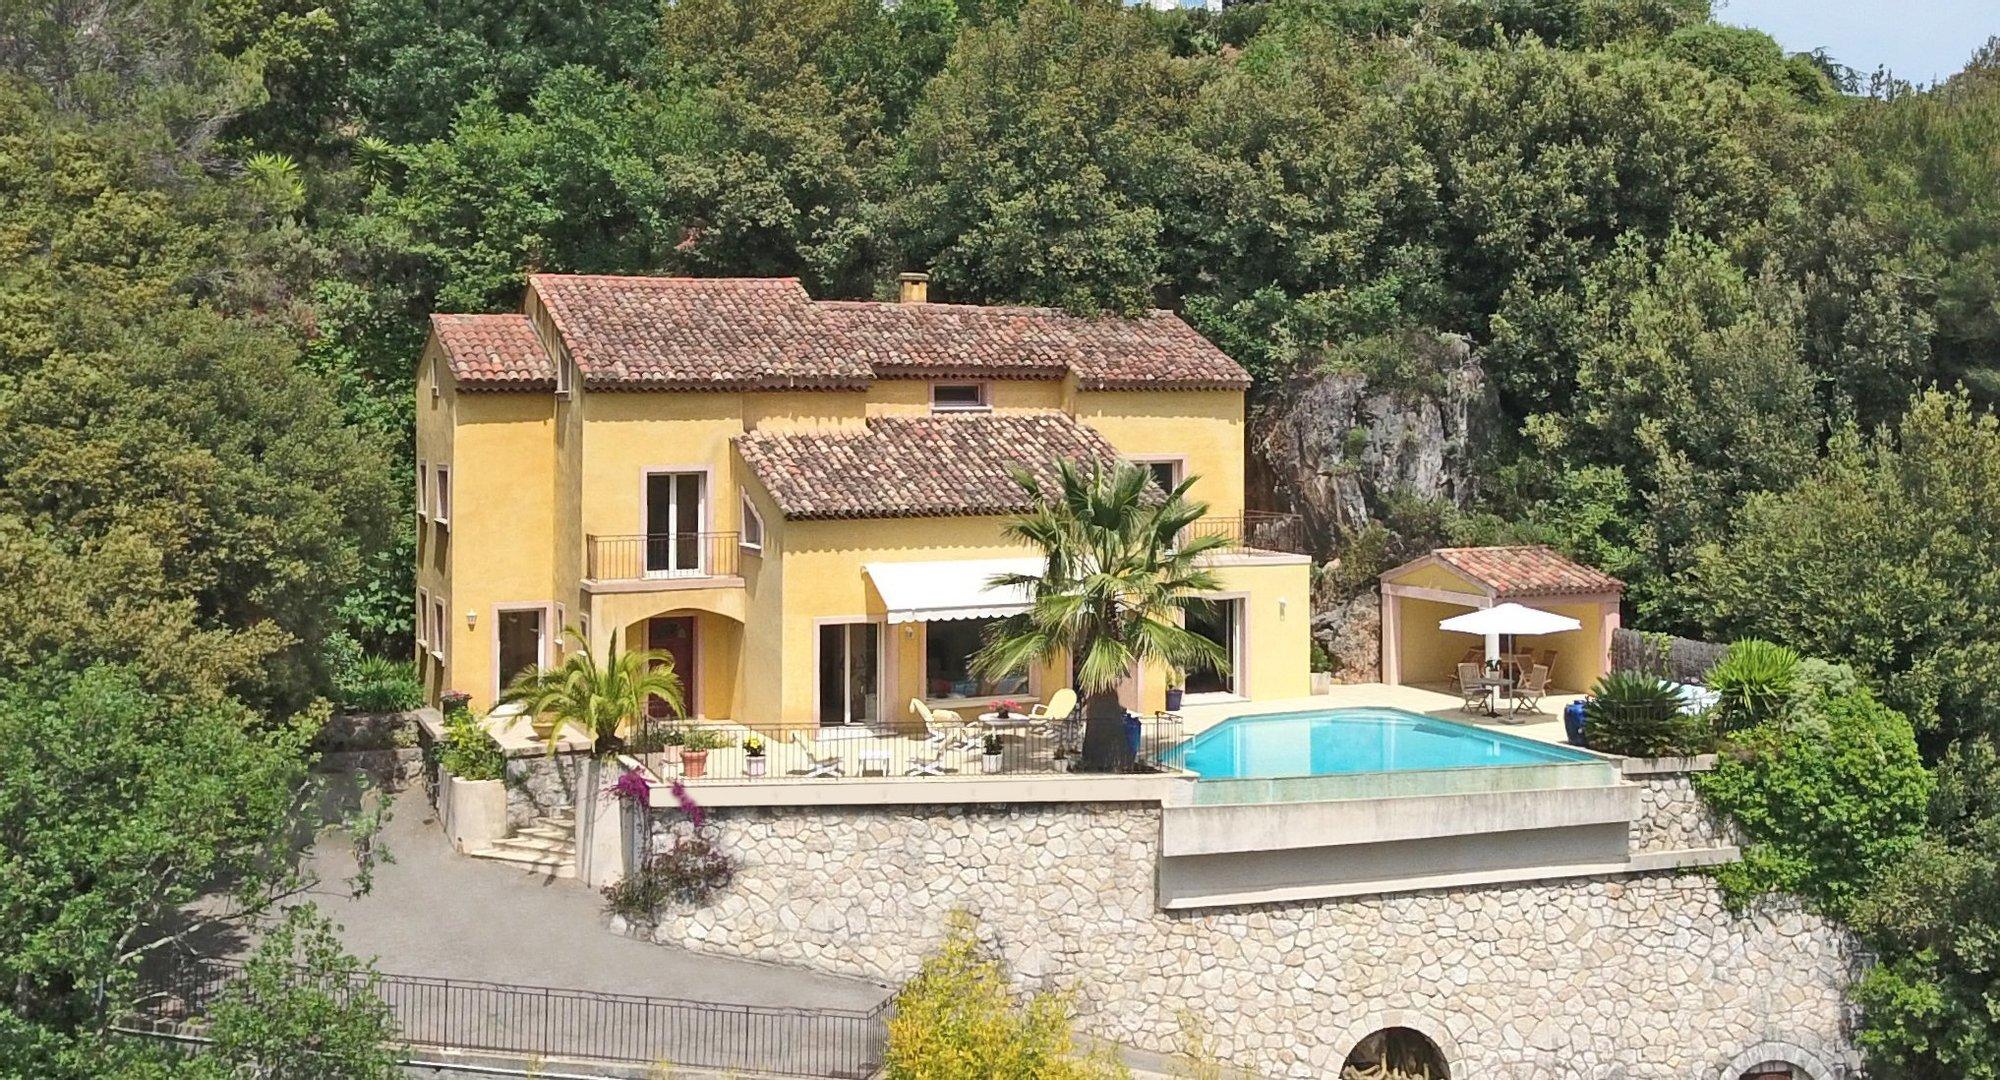 Villa in Vence, Provence-Alpes-Côte d'Azur, France 1